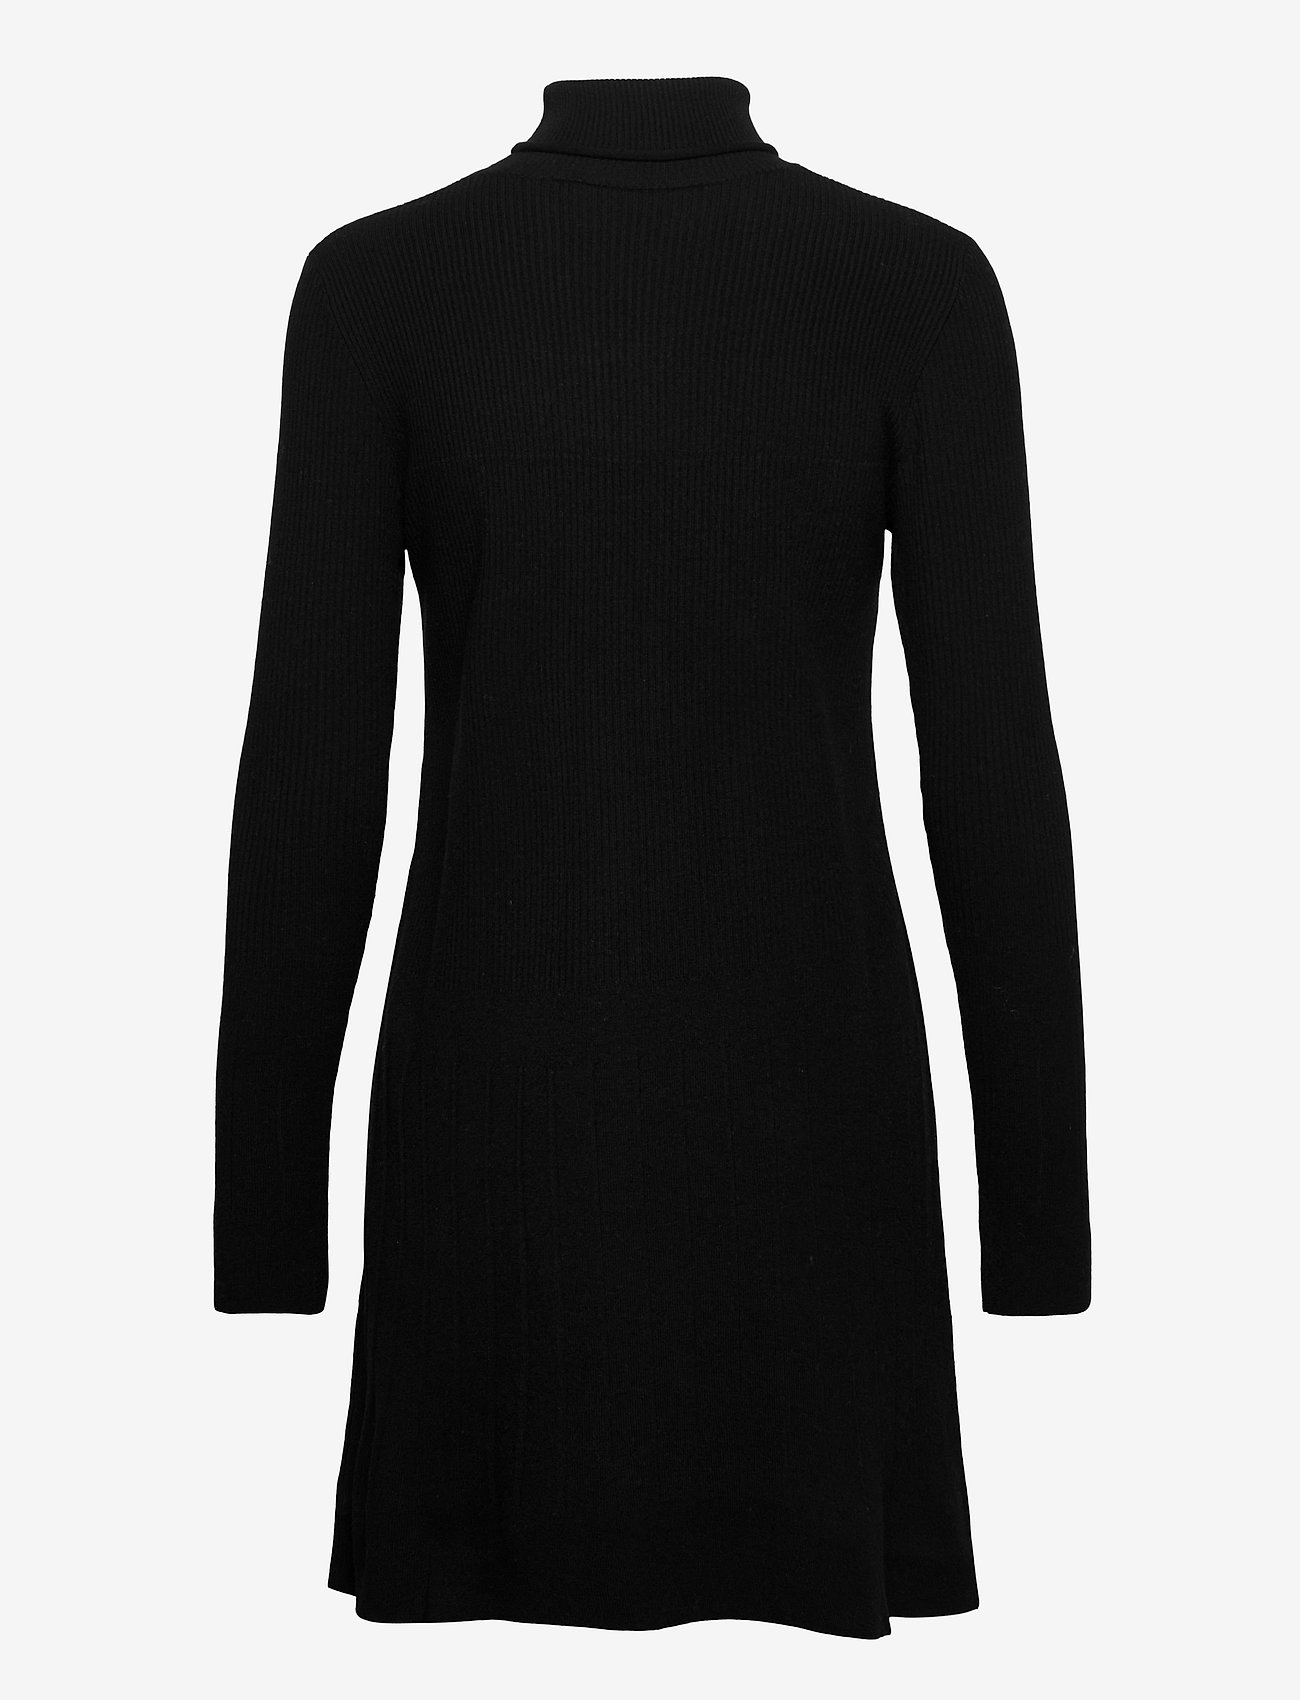 Max&Co. - CINEMA - alledaagse jurken - black - 1